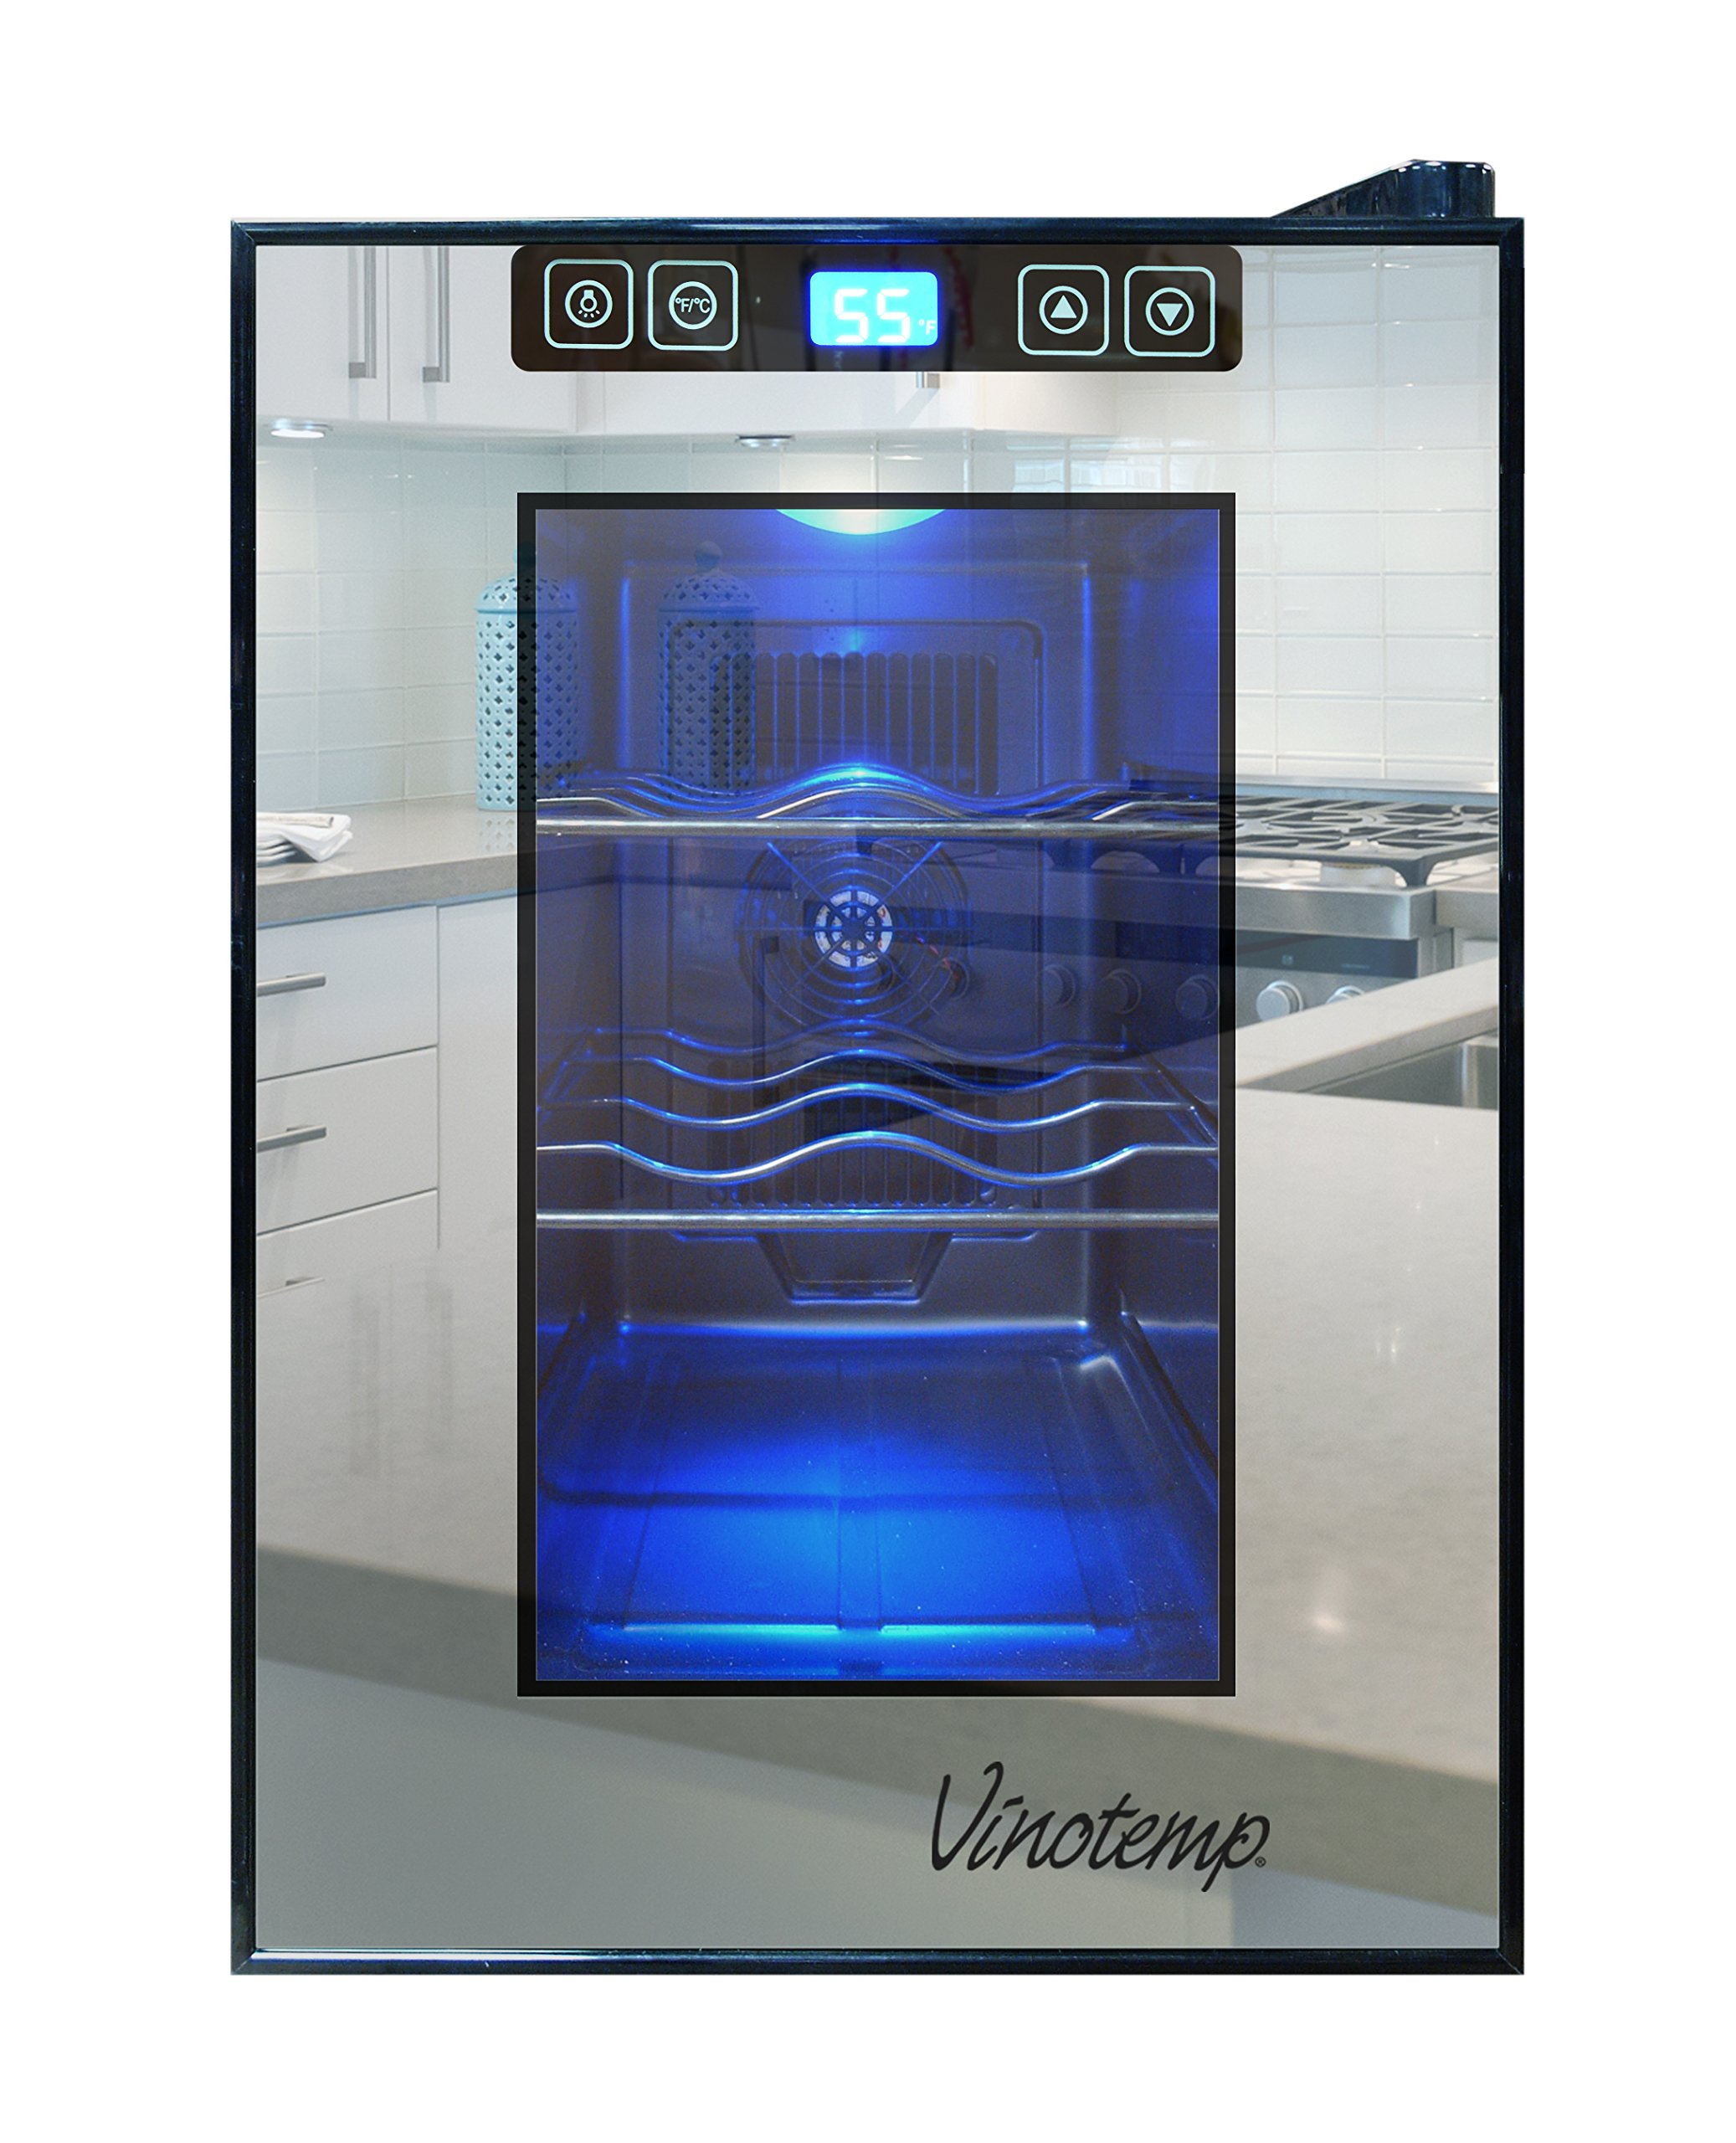 Vinotemp VT-6TSBM 6-Bottle Mirrored Thermoelectric Wine Cooler, Black by Vinotemp